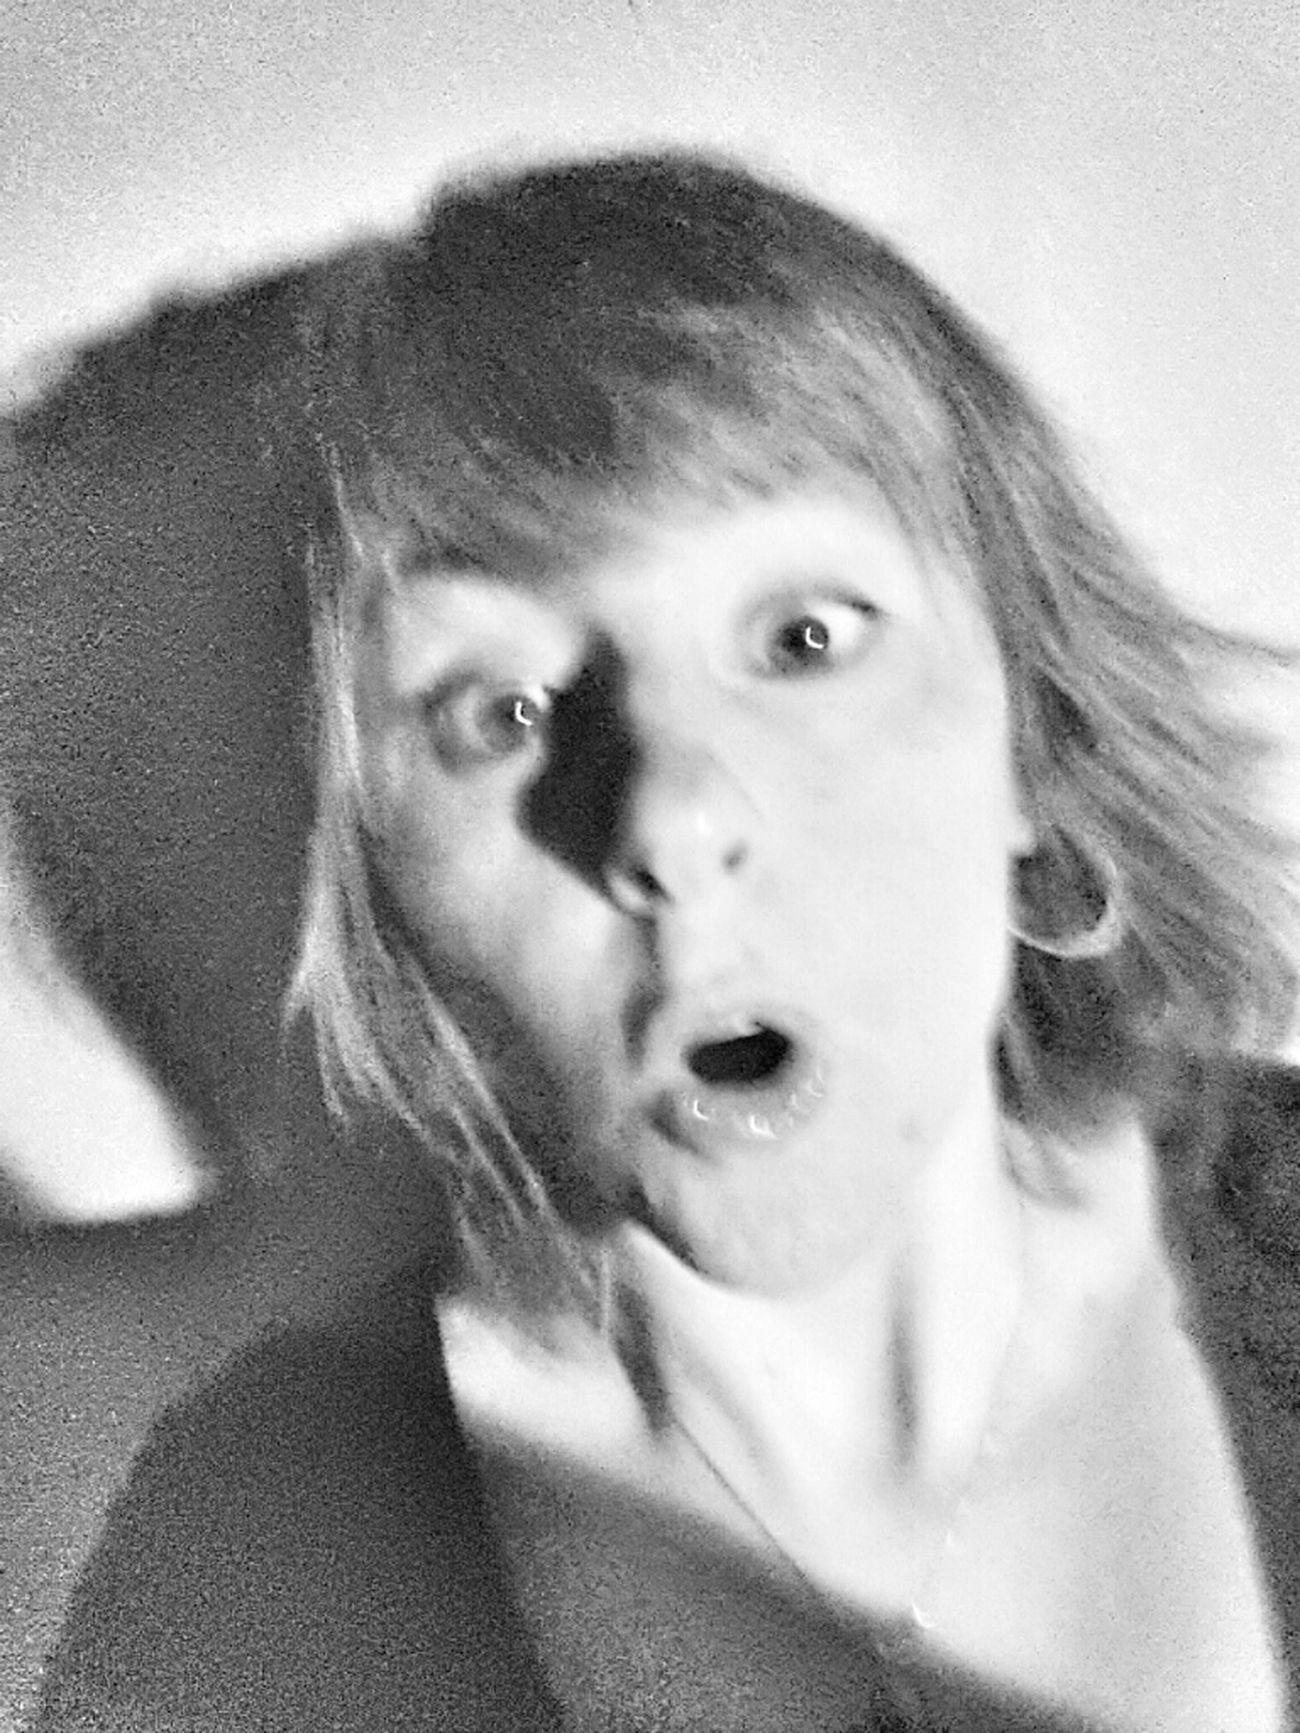 Blackandwhite Portrait Selfportrait Portrait Of A Woman Eye4photography  AMPt - Shoot Or Die